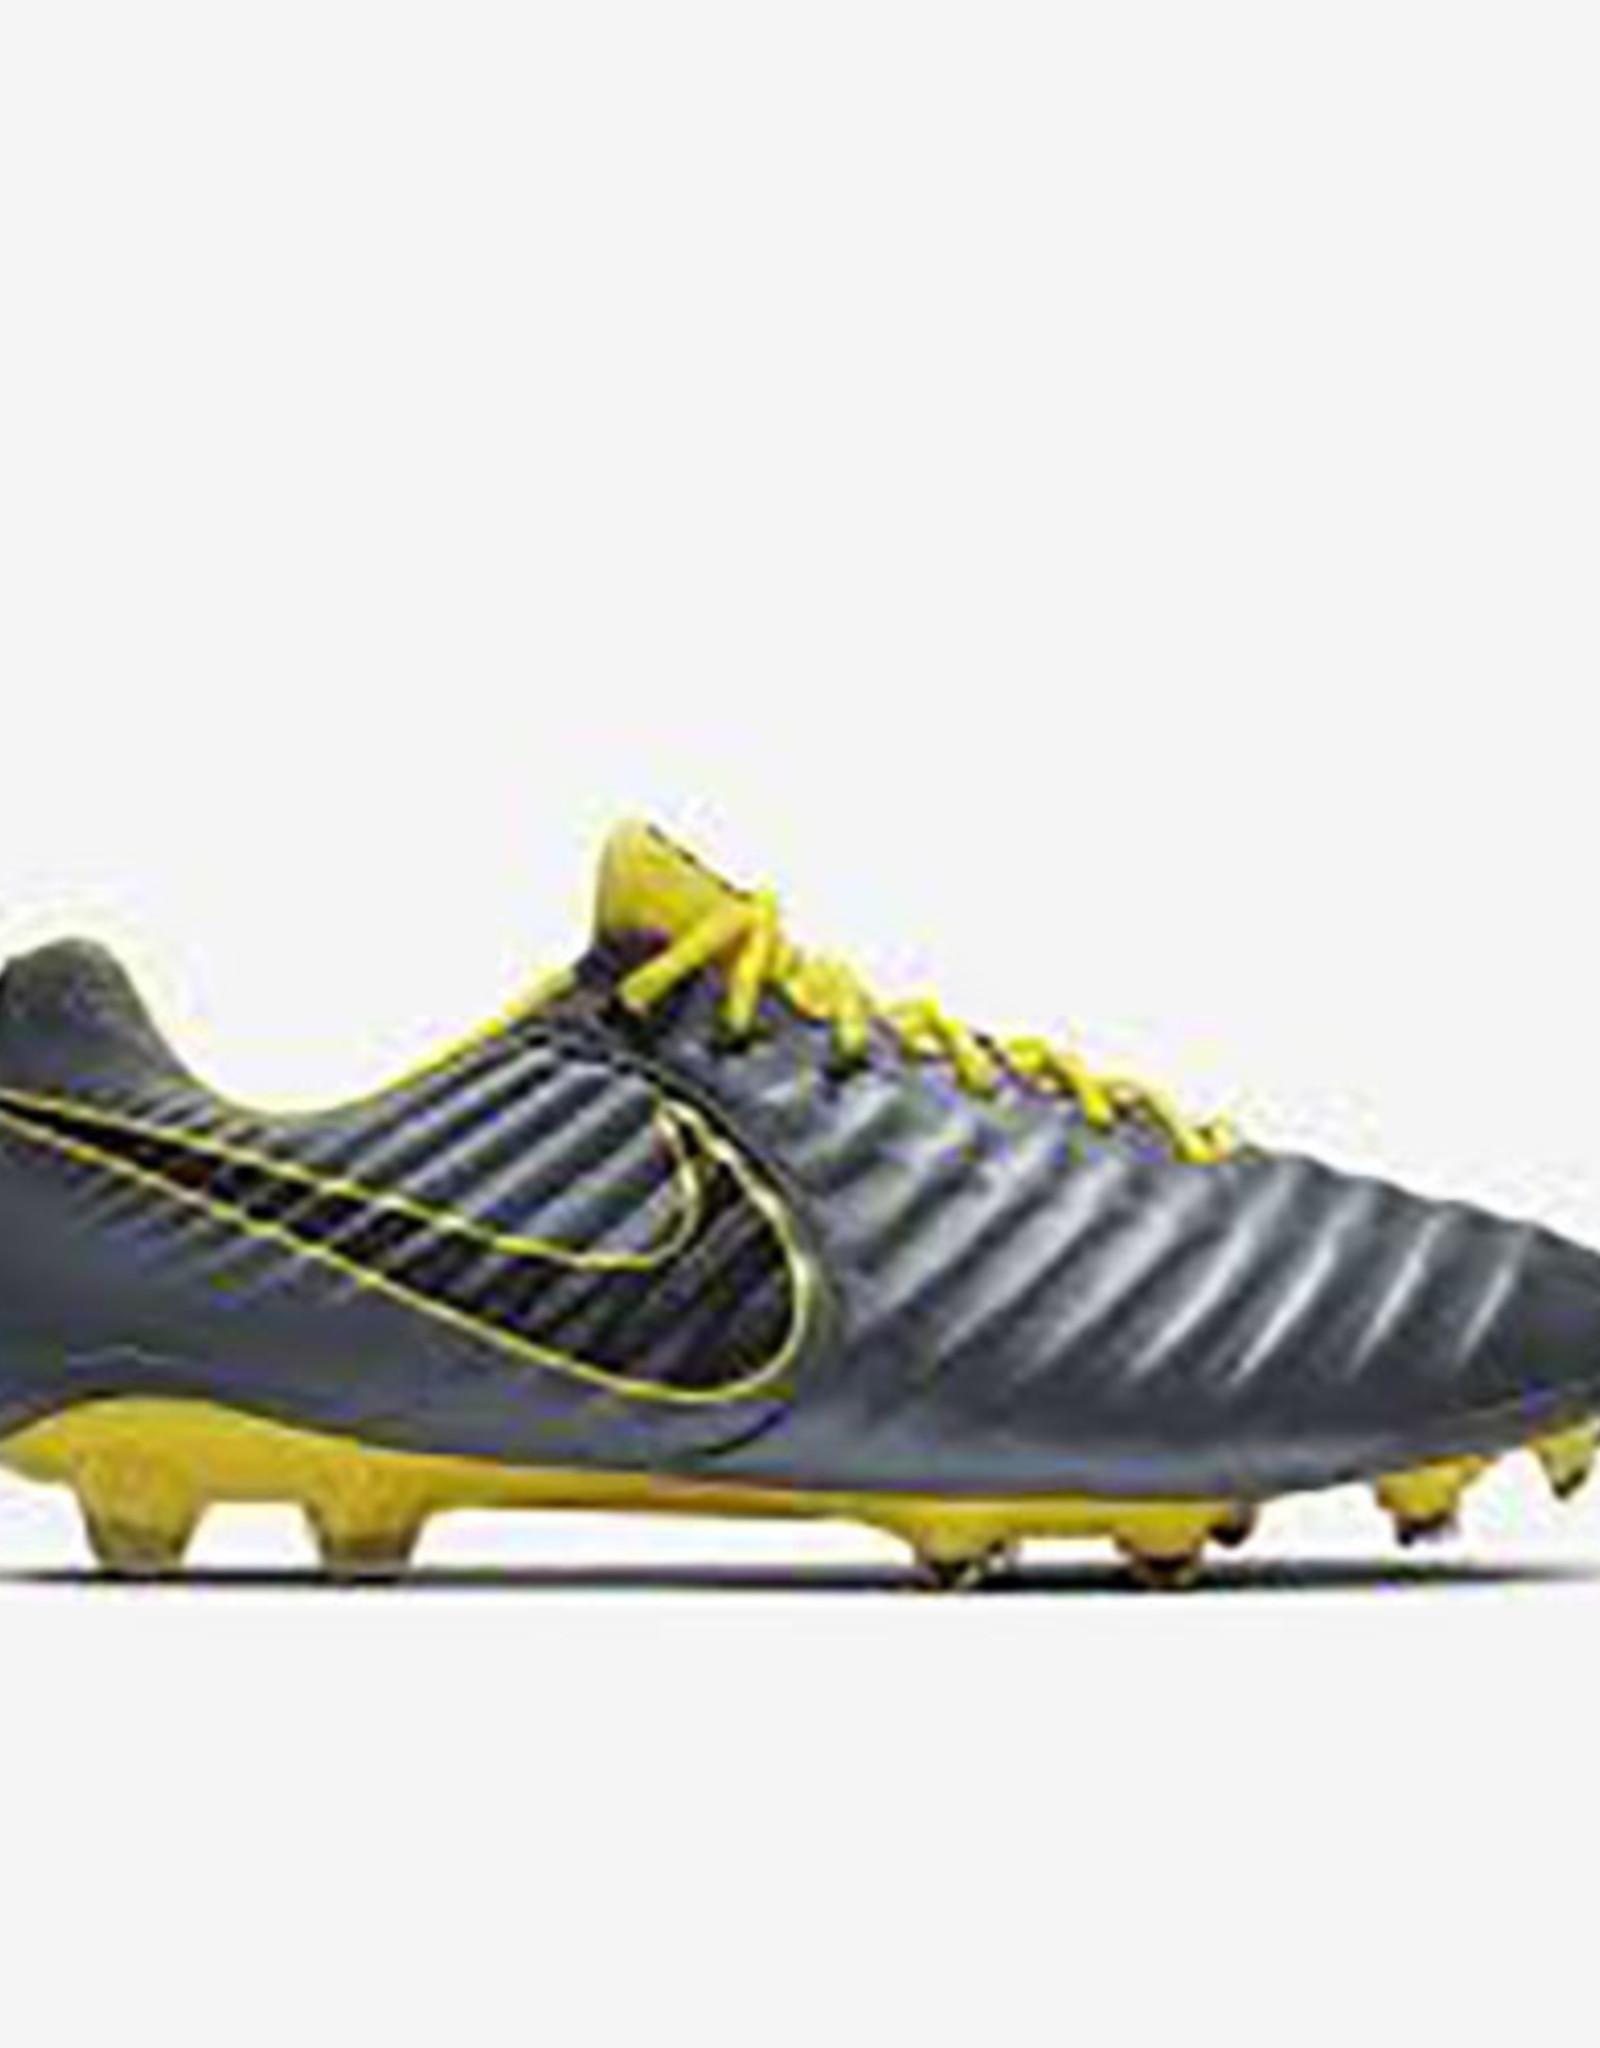 Nike Nike FG Legend Elite AH7238